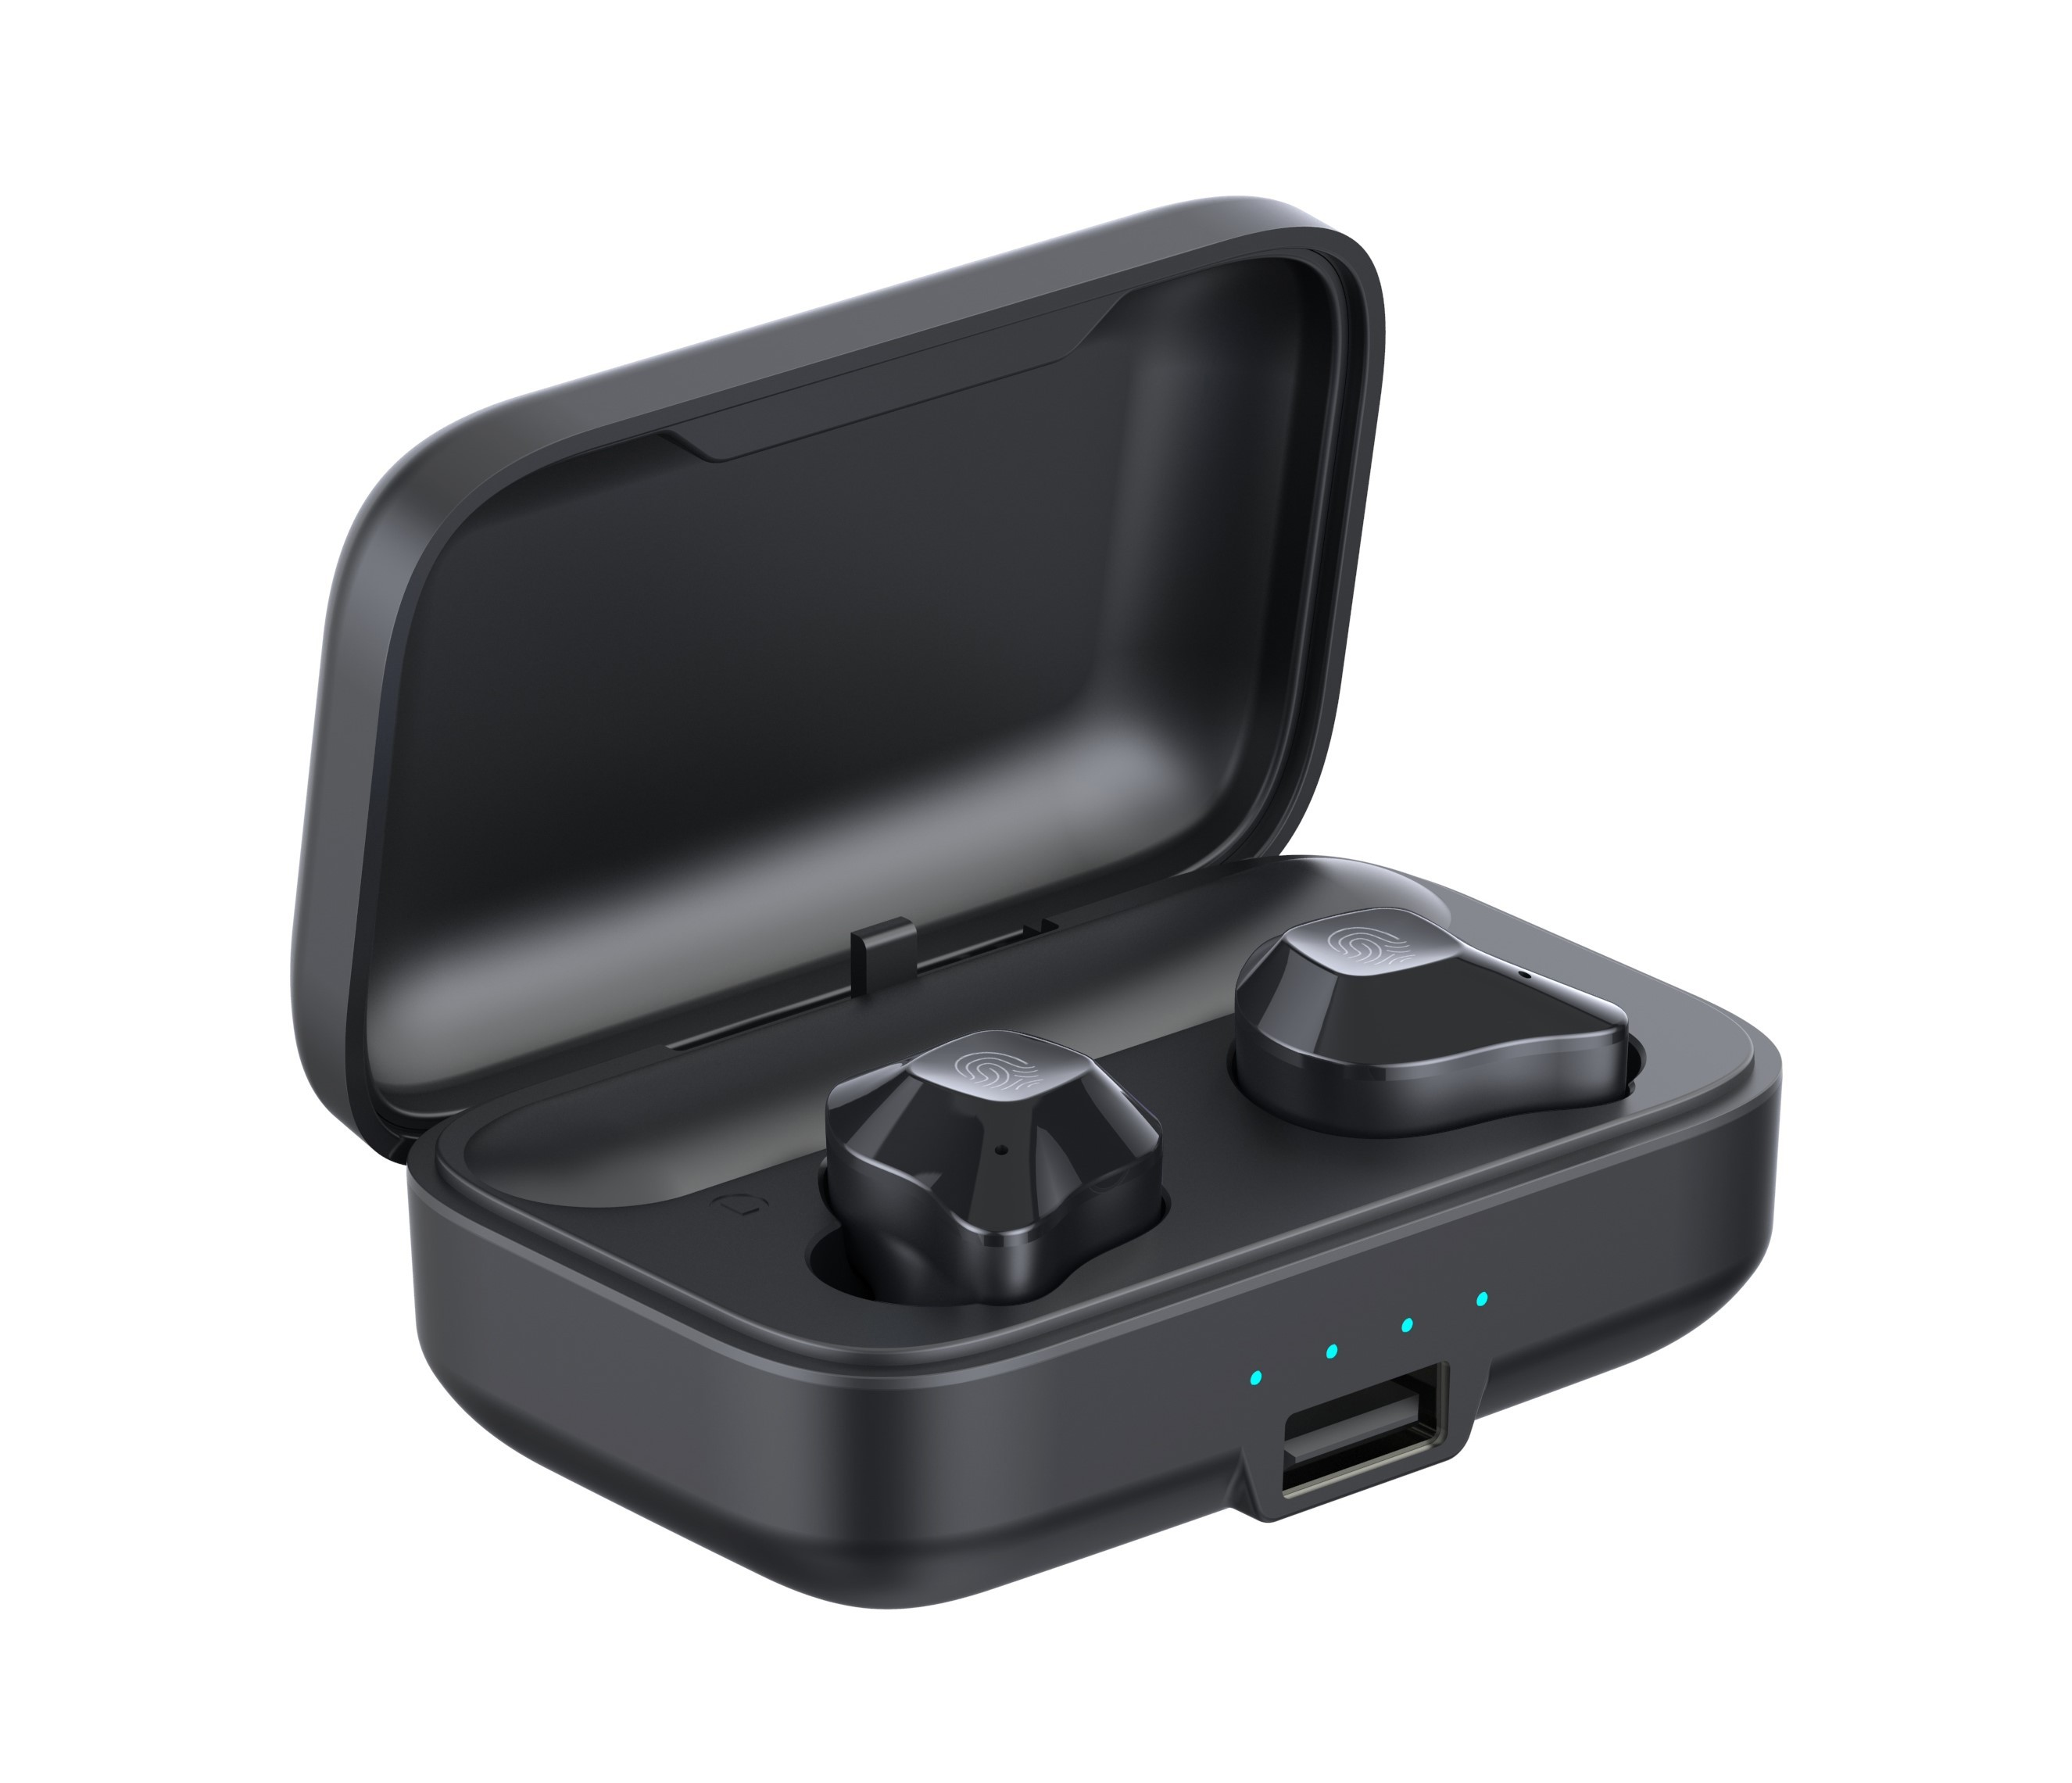 Casti Smart Techstar® TWS S15 , Wireless, Bluetooth V5.0, HD Audio, Touch, IPX6, iOS, Android, 1500mAh, Negru